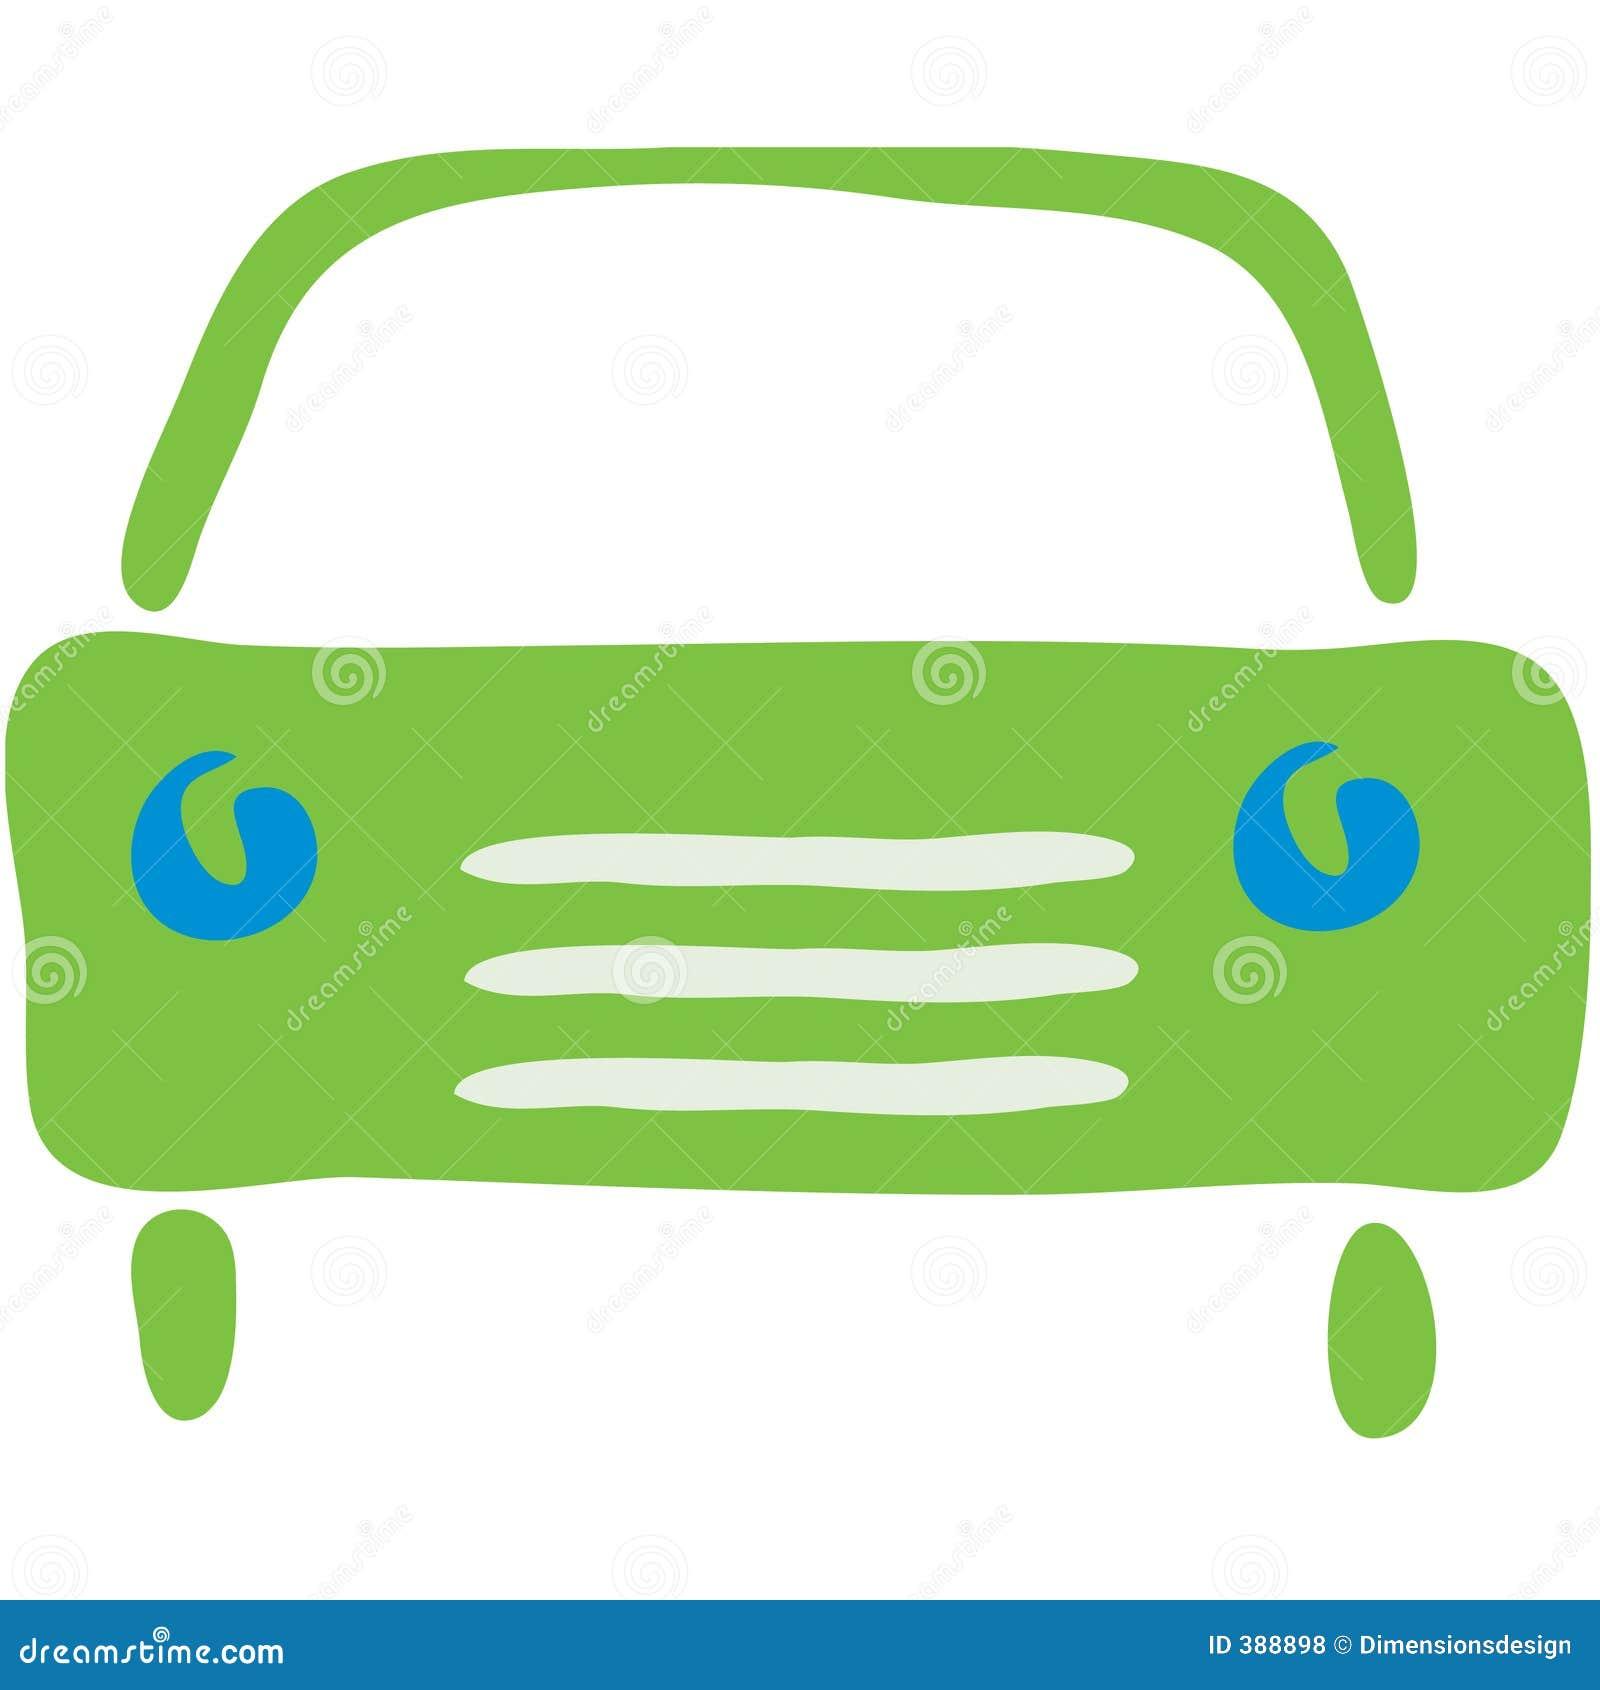 Car Stock Photos: Car Symbol Stock Illustration. Illustration Of Sport, Icon